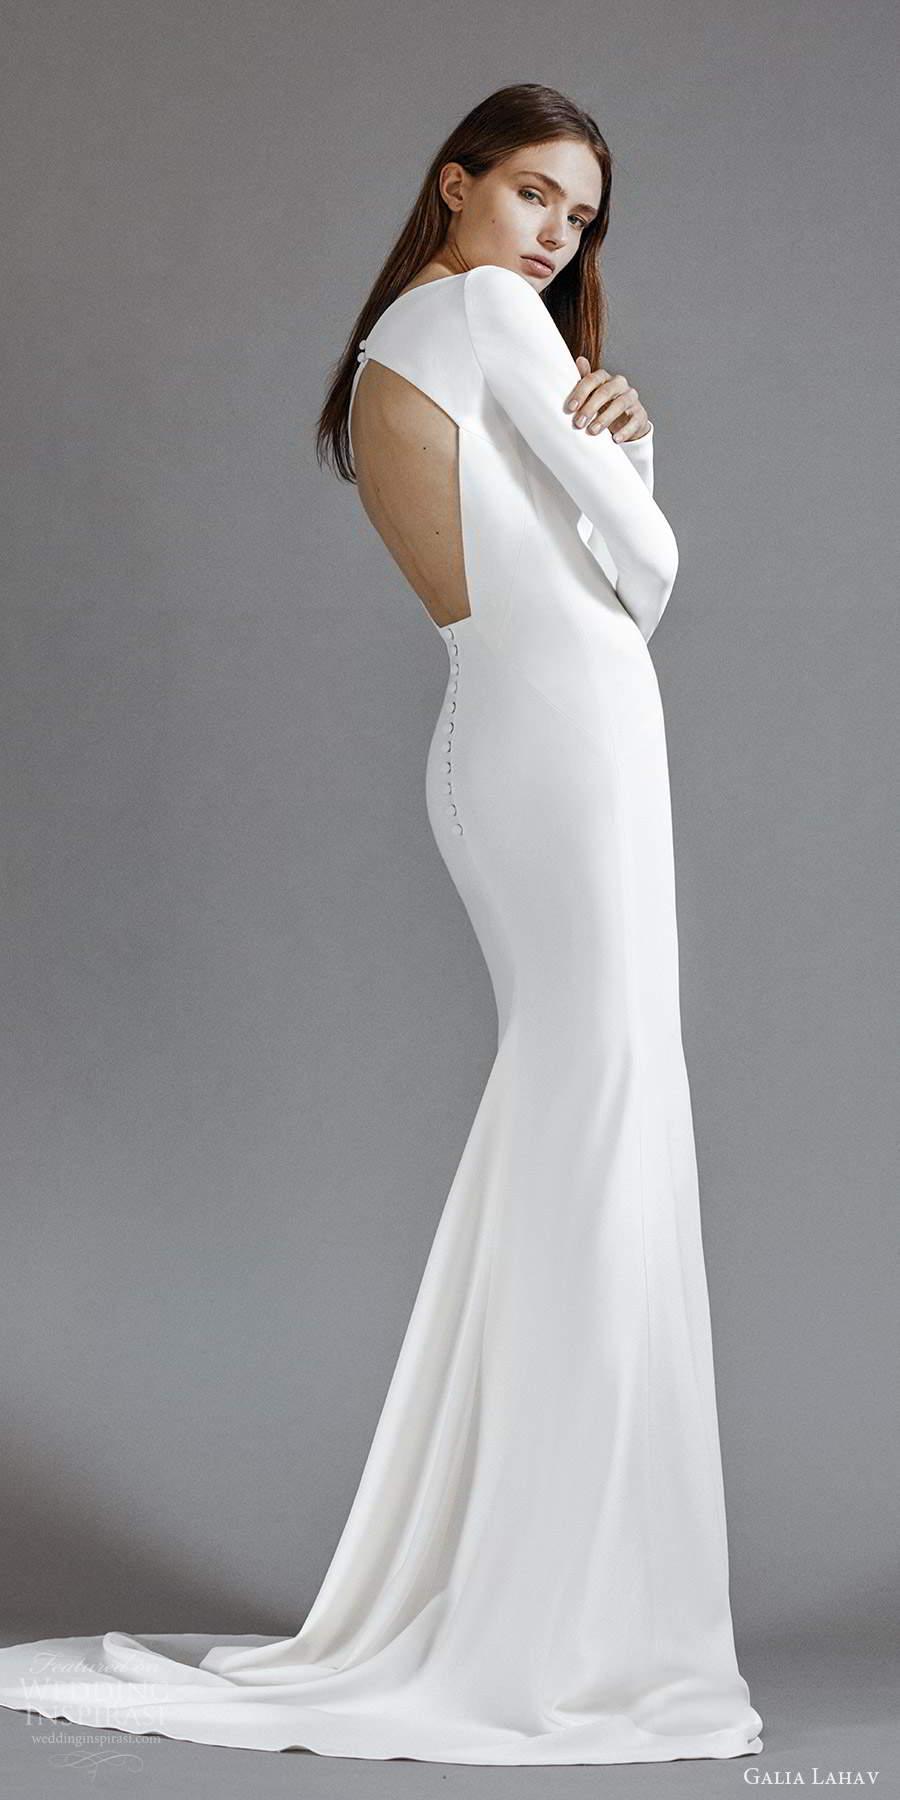 galia lahav 2021 rtw bridal long sleeves bateau neckline clean minimalist sheath column a line wedding dress chapel train (4) bv